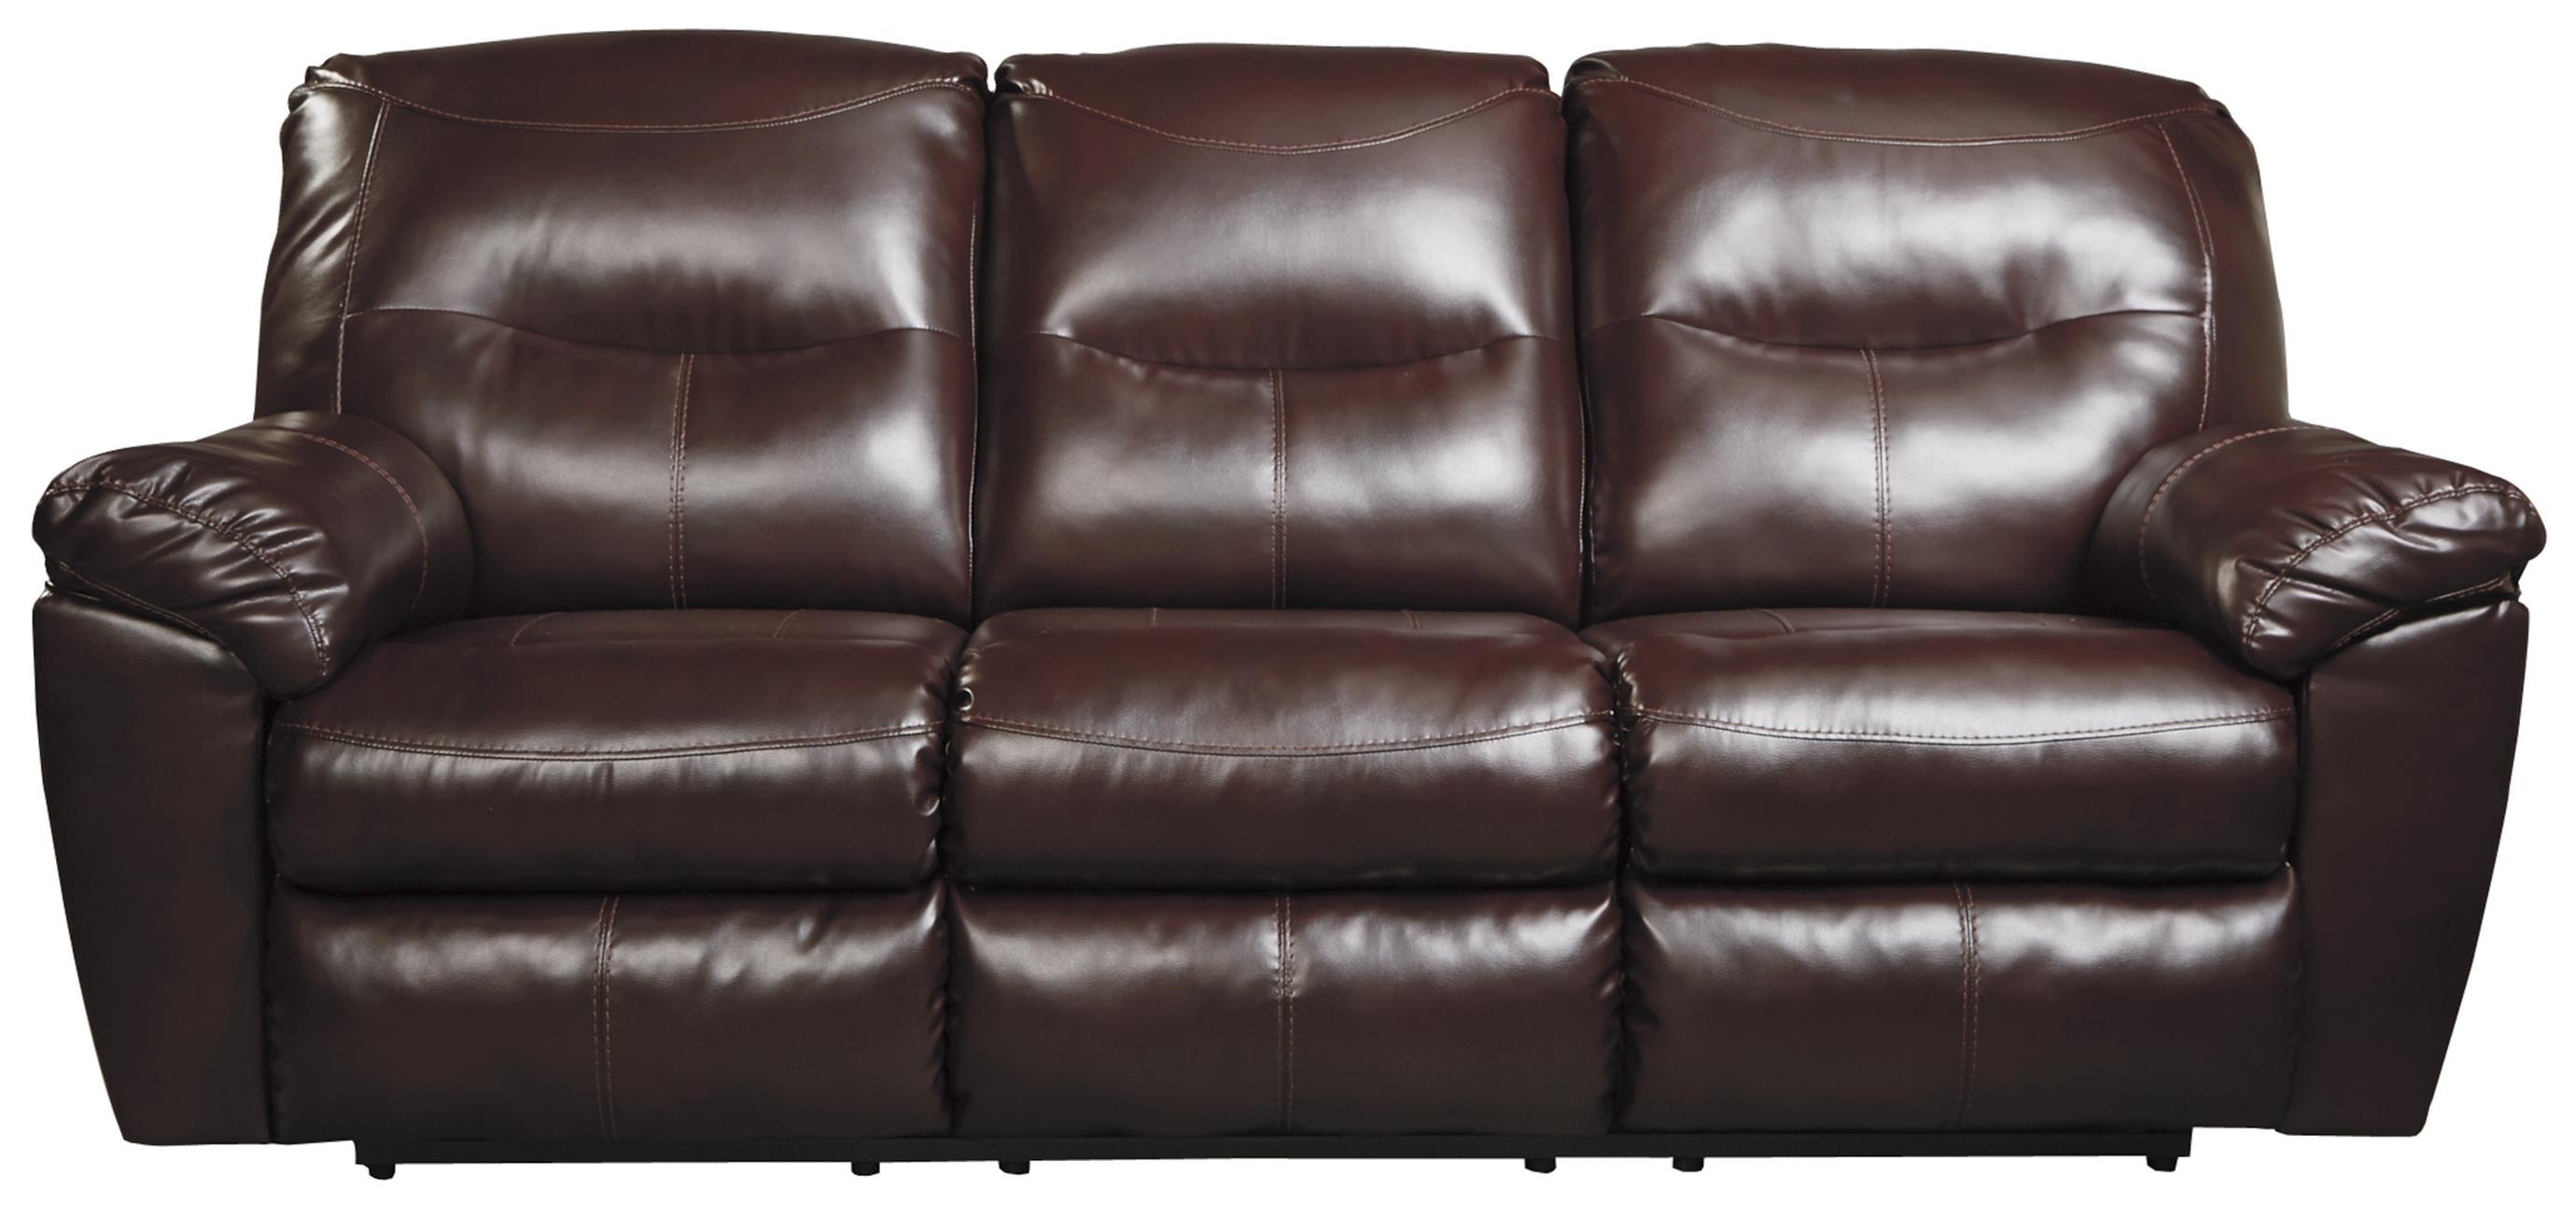 Signature Design By Ashley Kilzer DuraBlend® Contemporary Reclining Sofa    Royal Furniture   Reclining Sofa Part 66